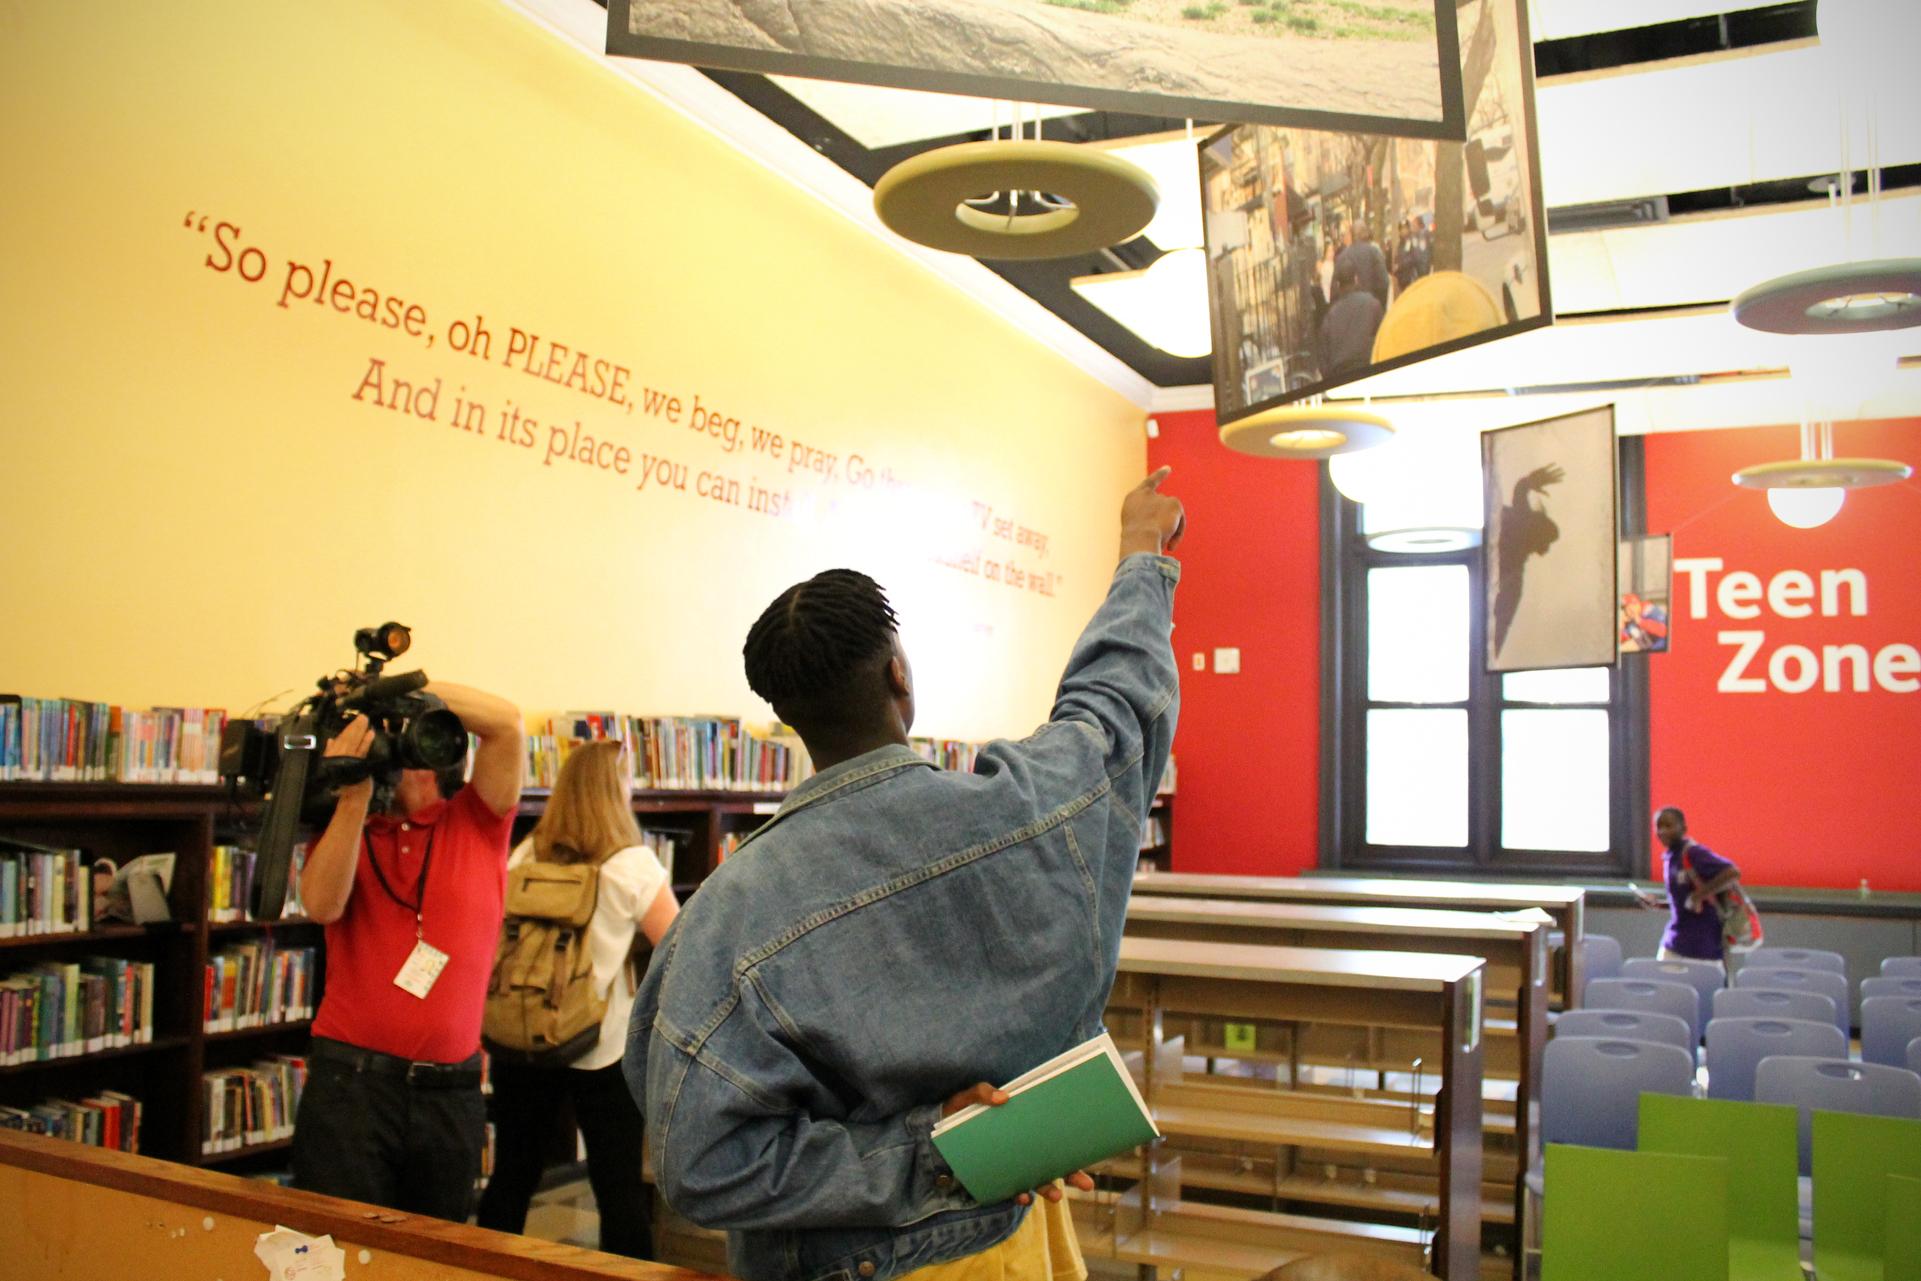 Prince explaining his work to New York One news cameras.